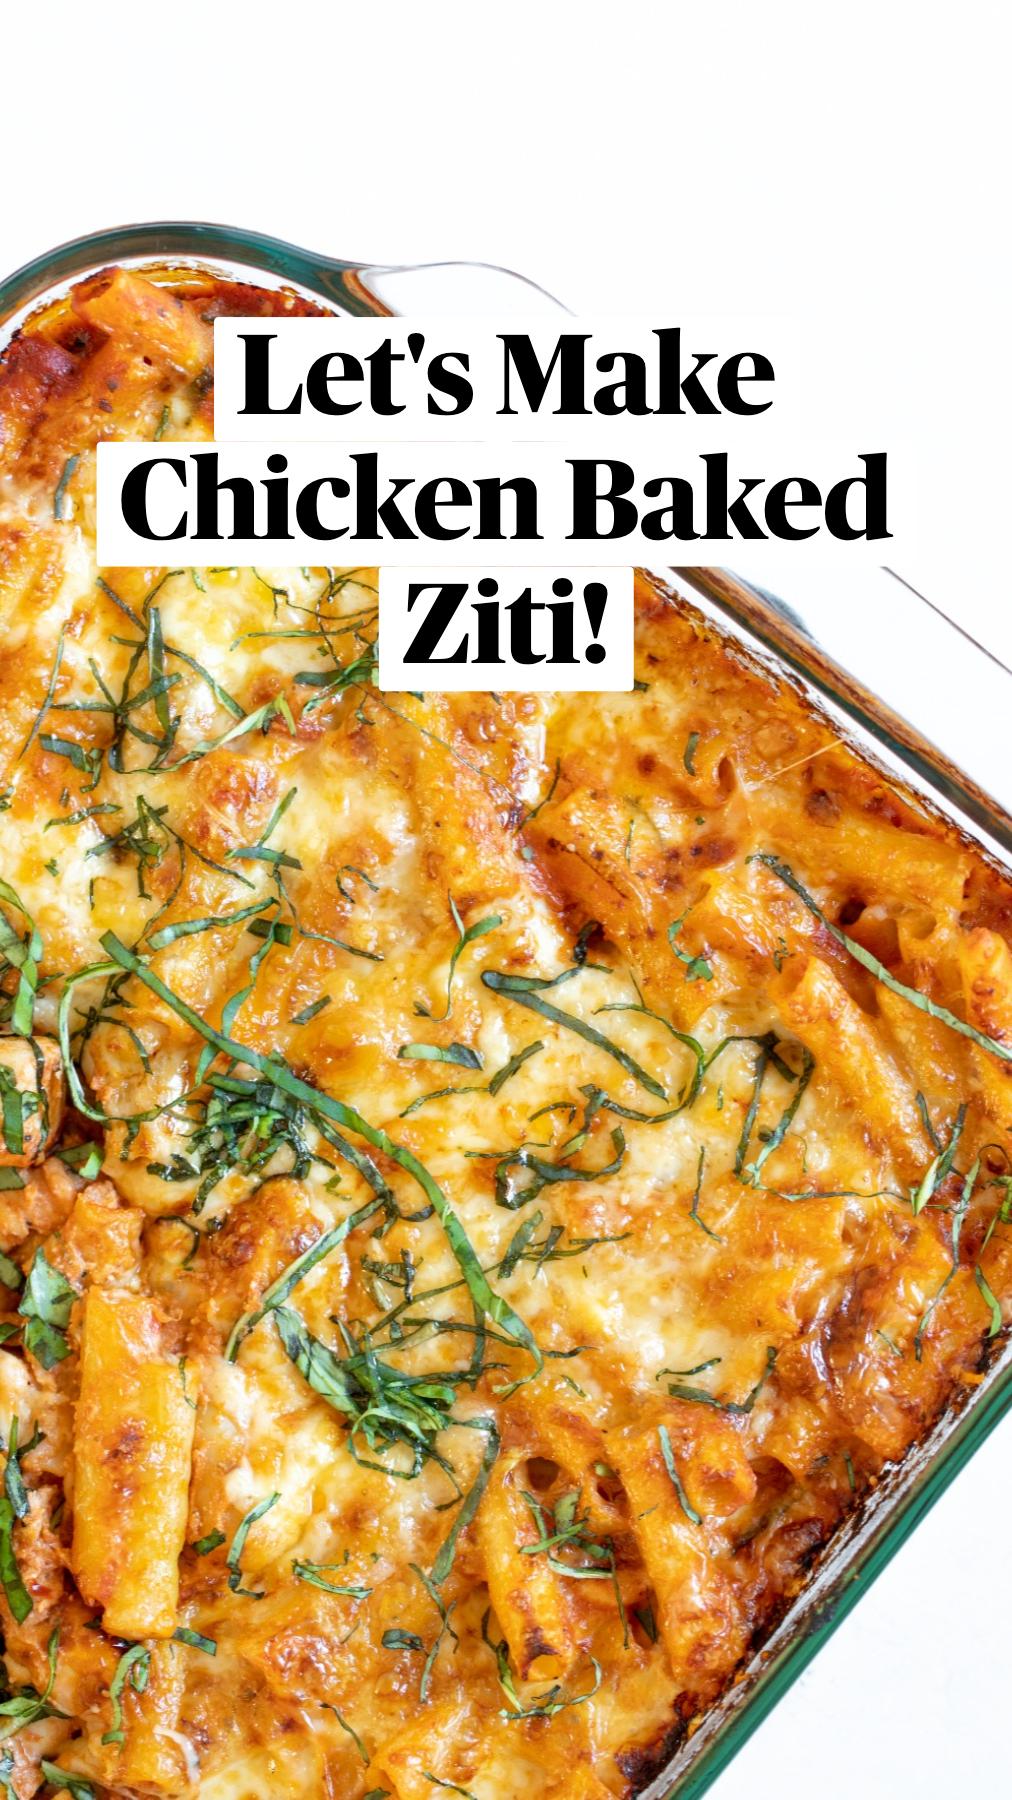 Chicken Baked Ziti (VIDEO)